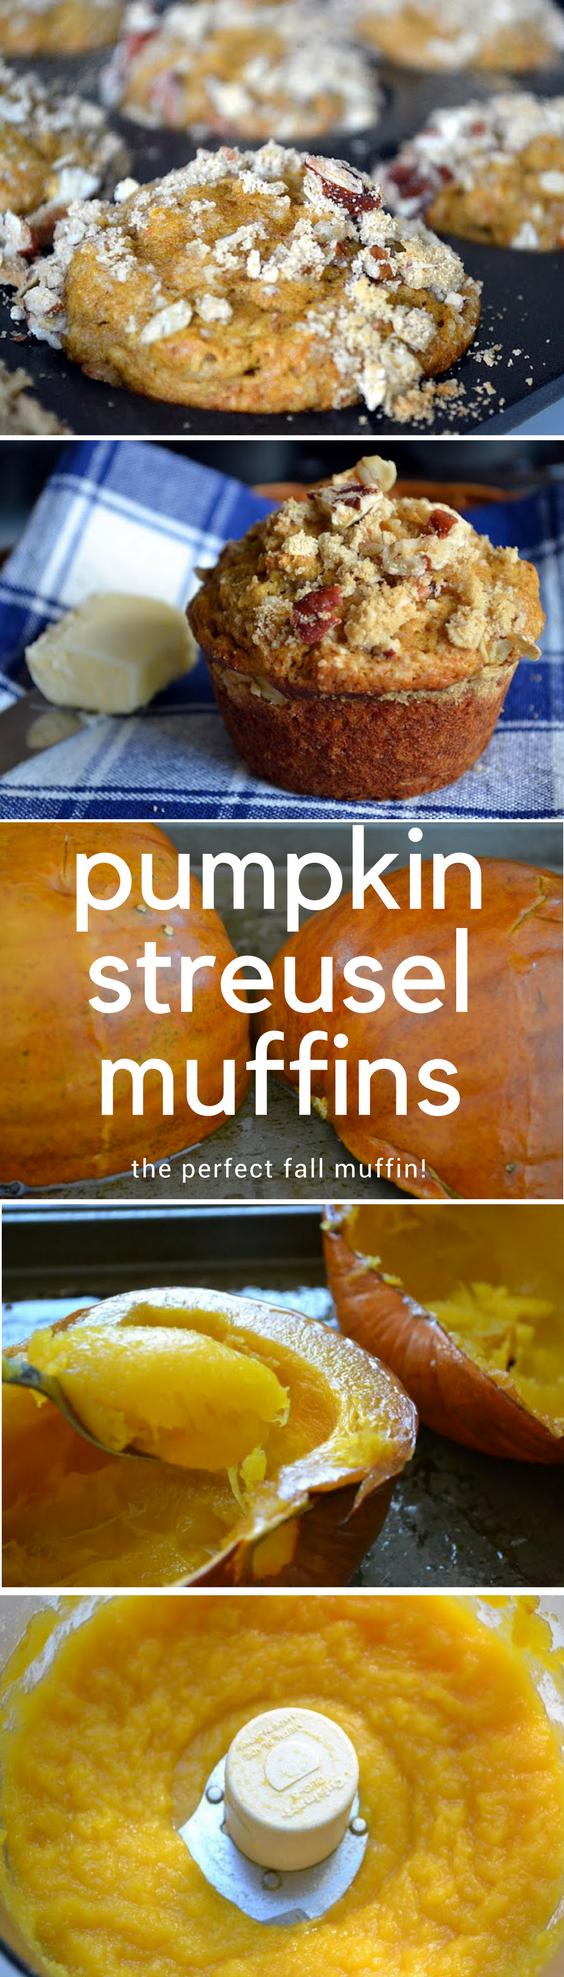 These Pumpkin Streusel Muffins pin